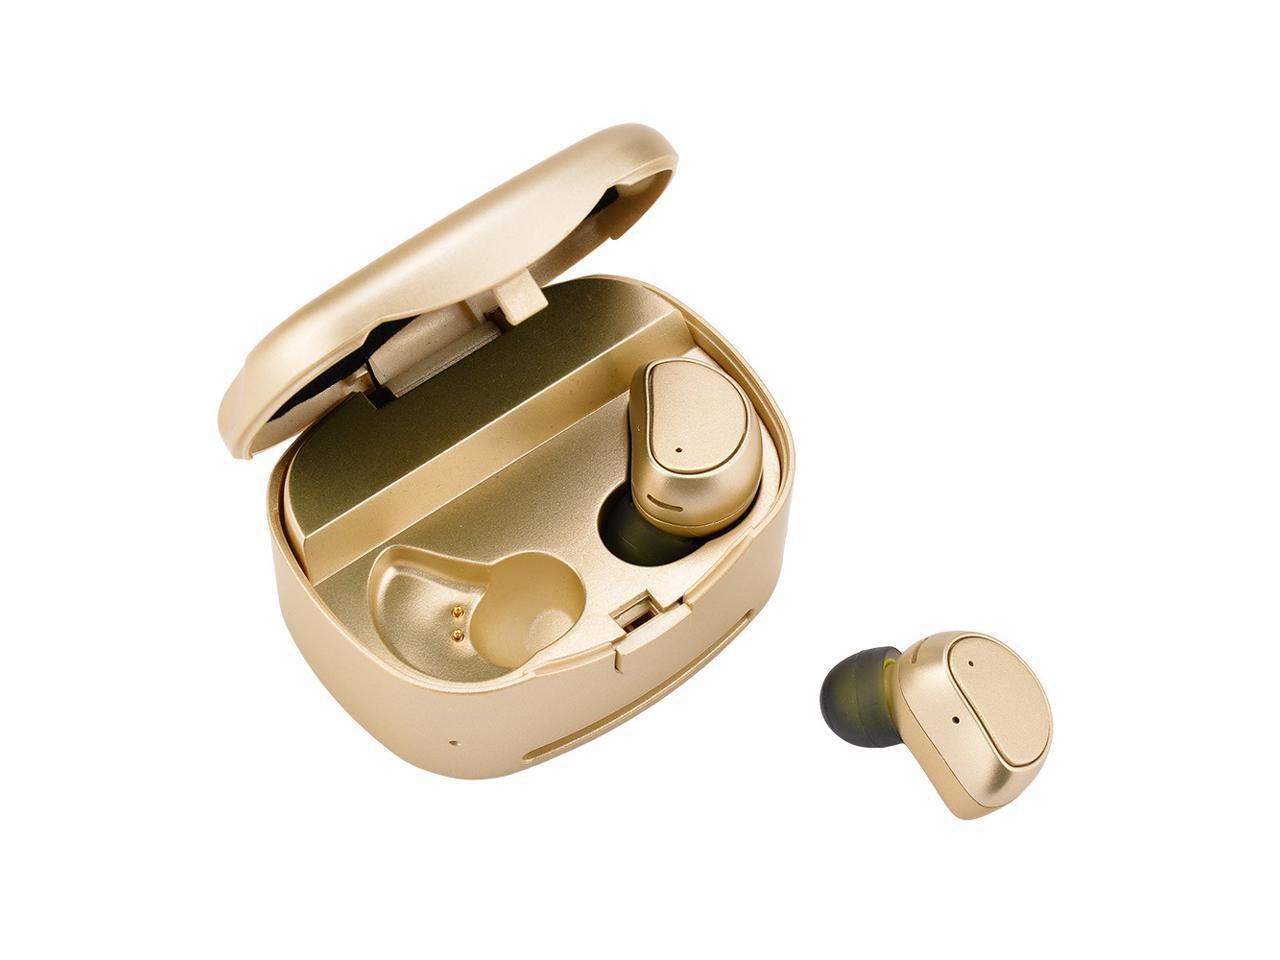 TWS True Wireless Stereo In-Ear Bluetooth Earphones with chargebox (6-months Warranty)